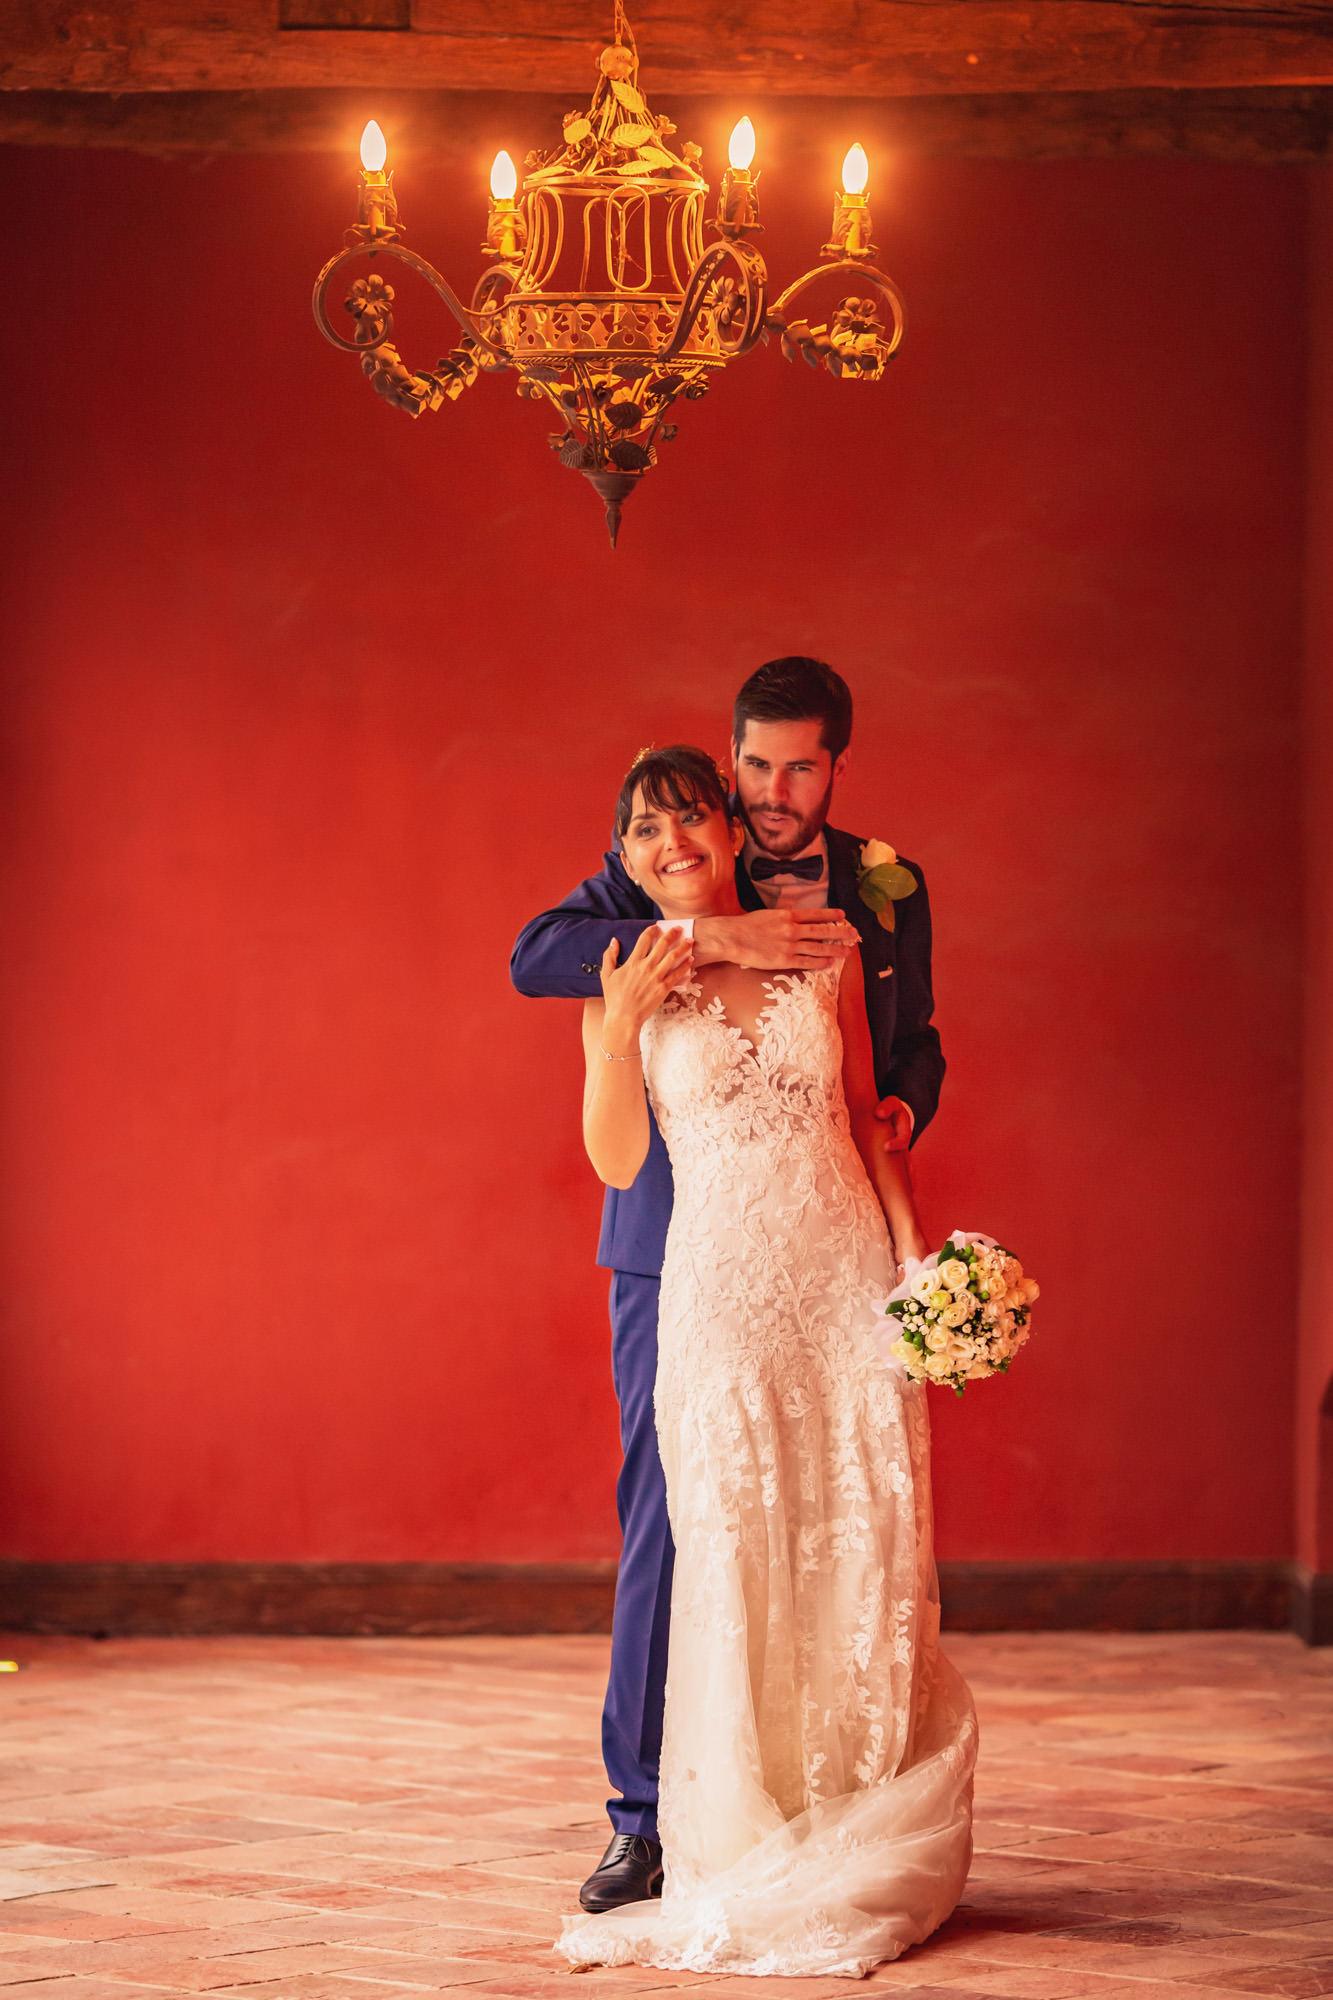 Mariage Nice Les Arcs Font du Broc Provence 3